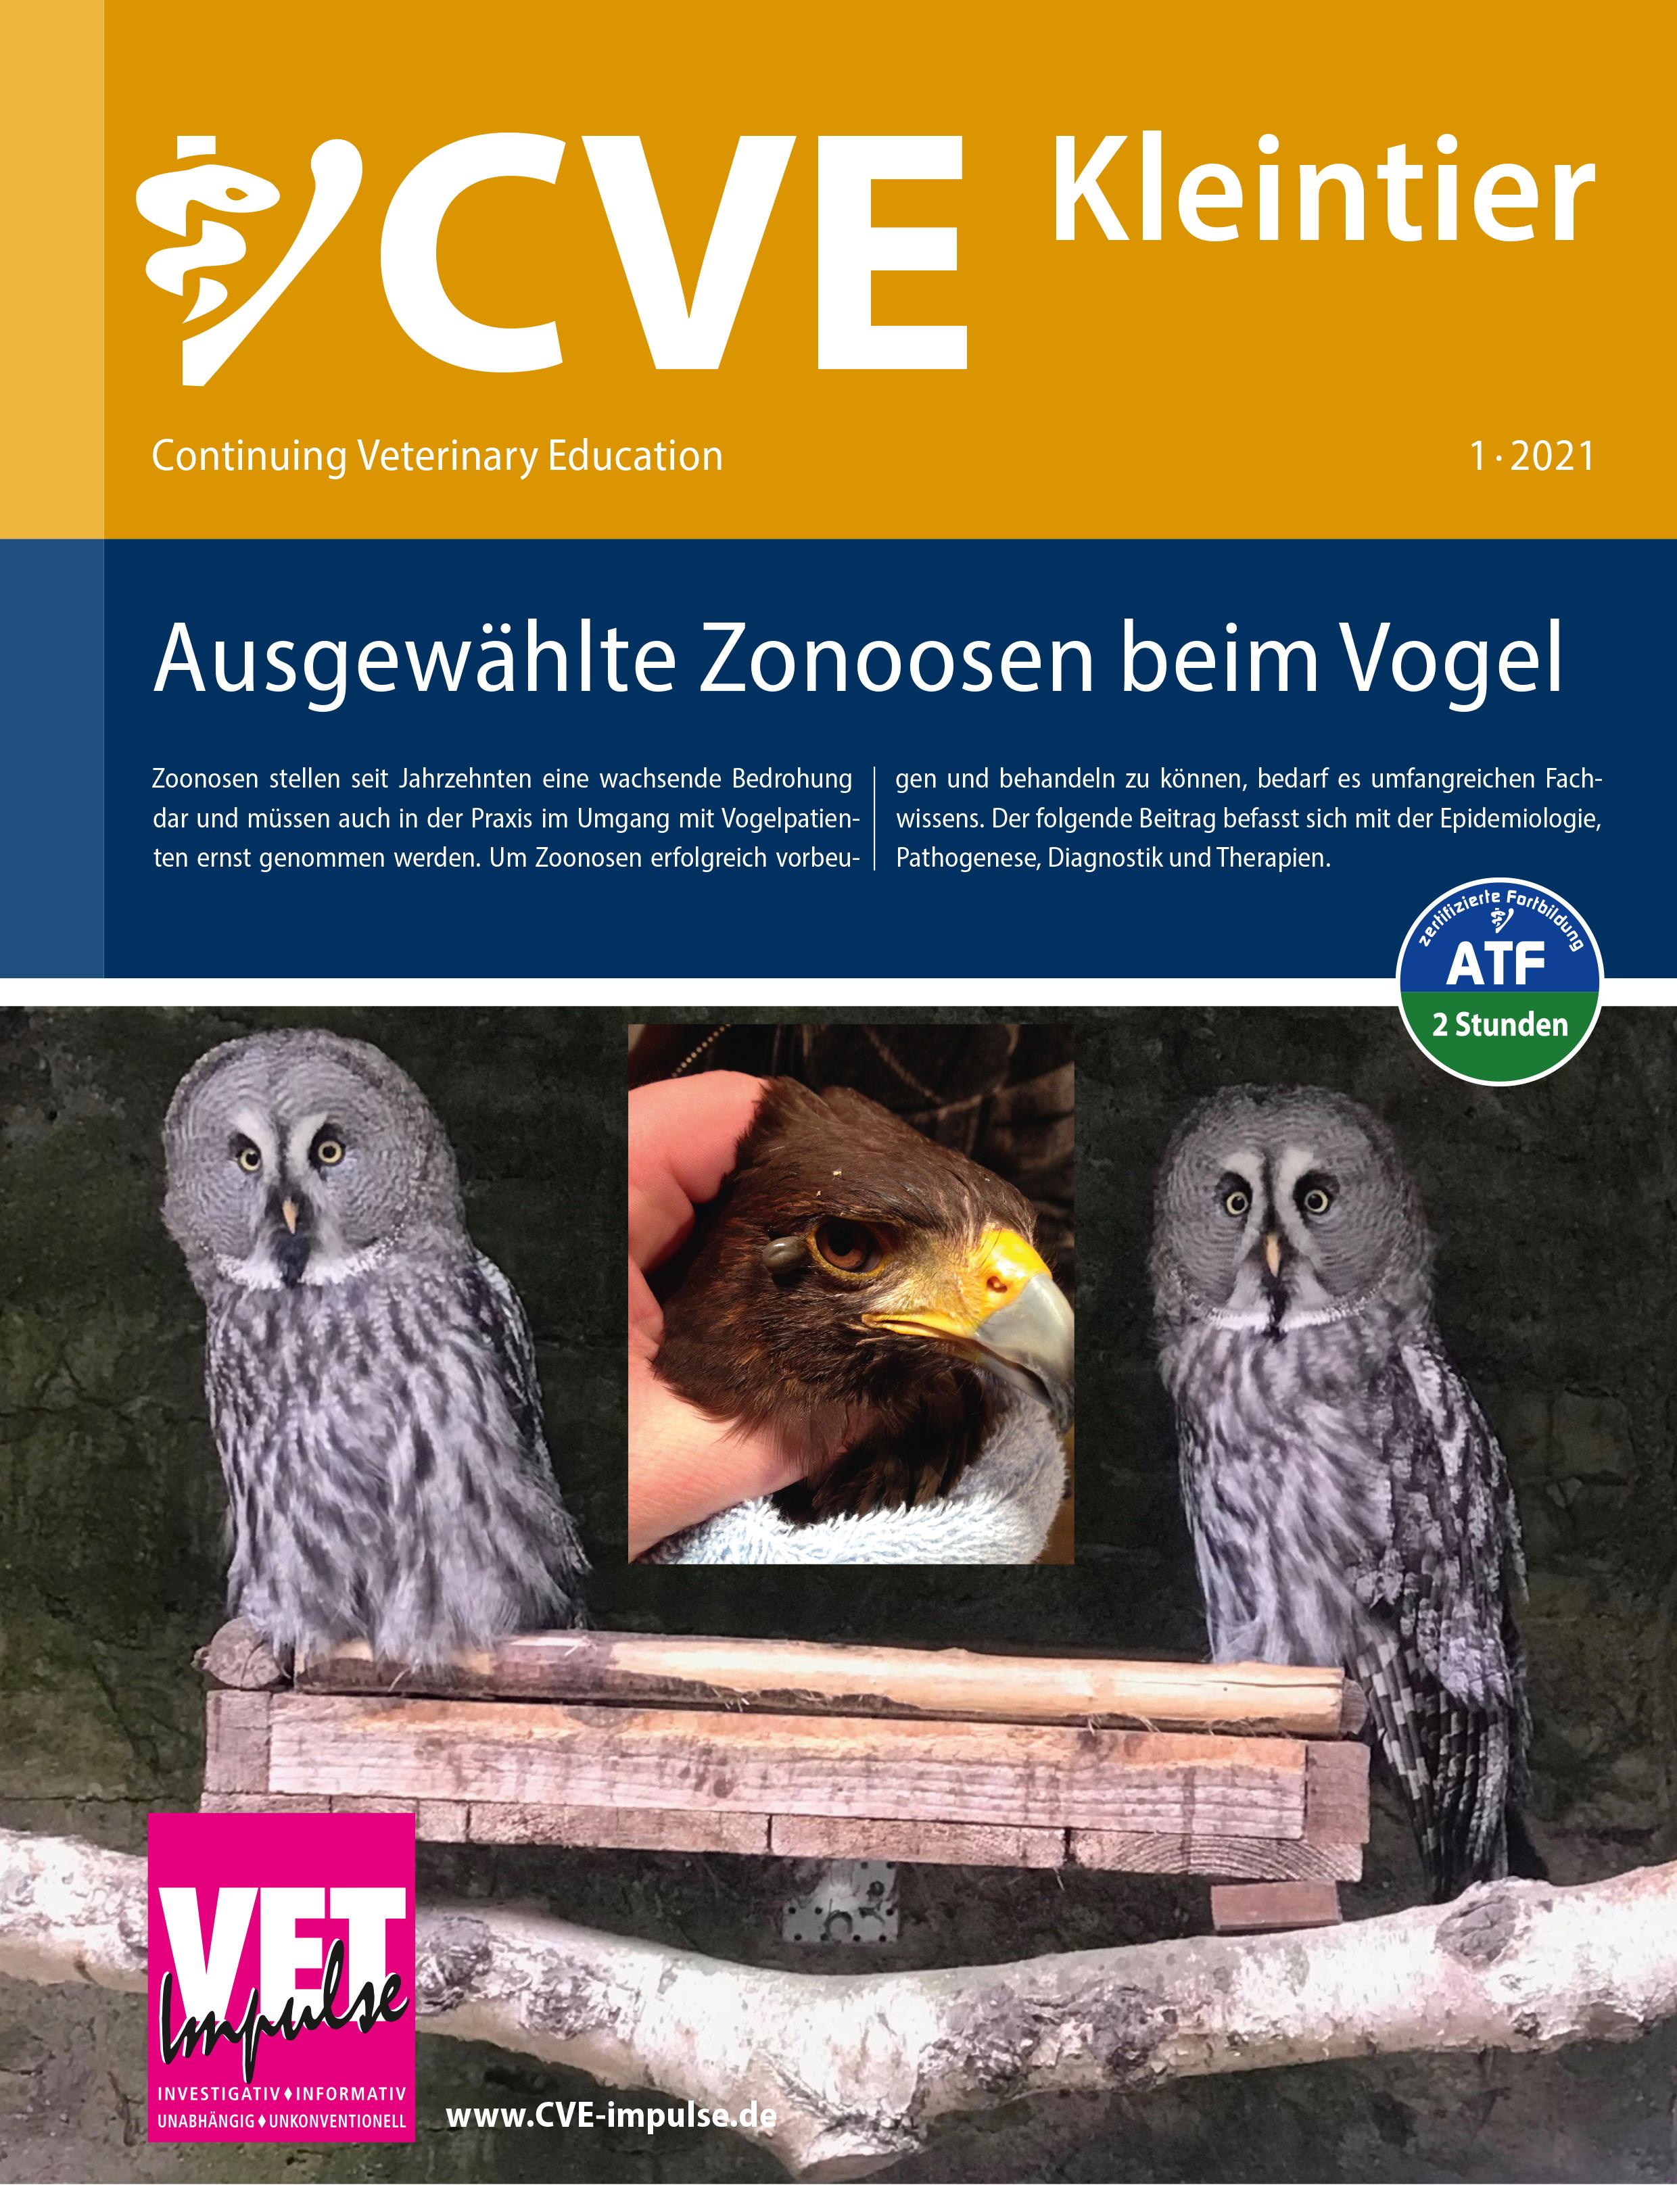 CVE-Kleintier_Titel_2021_1